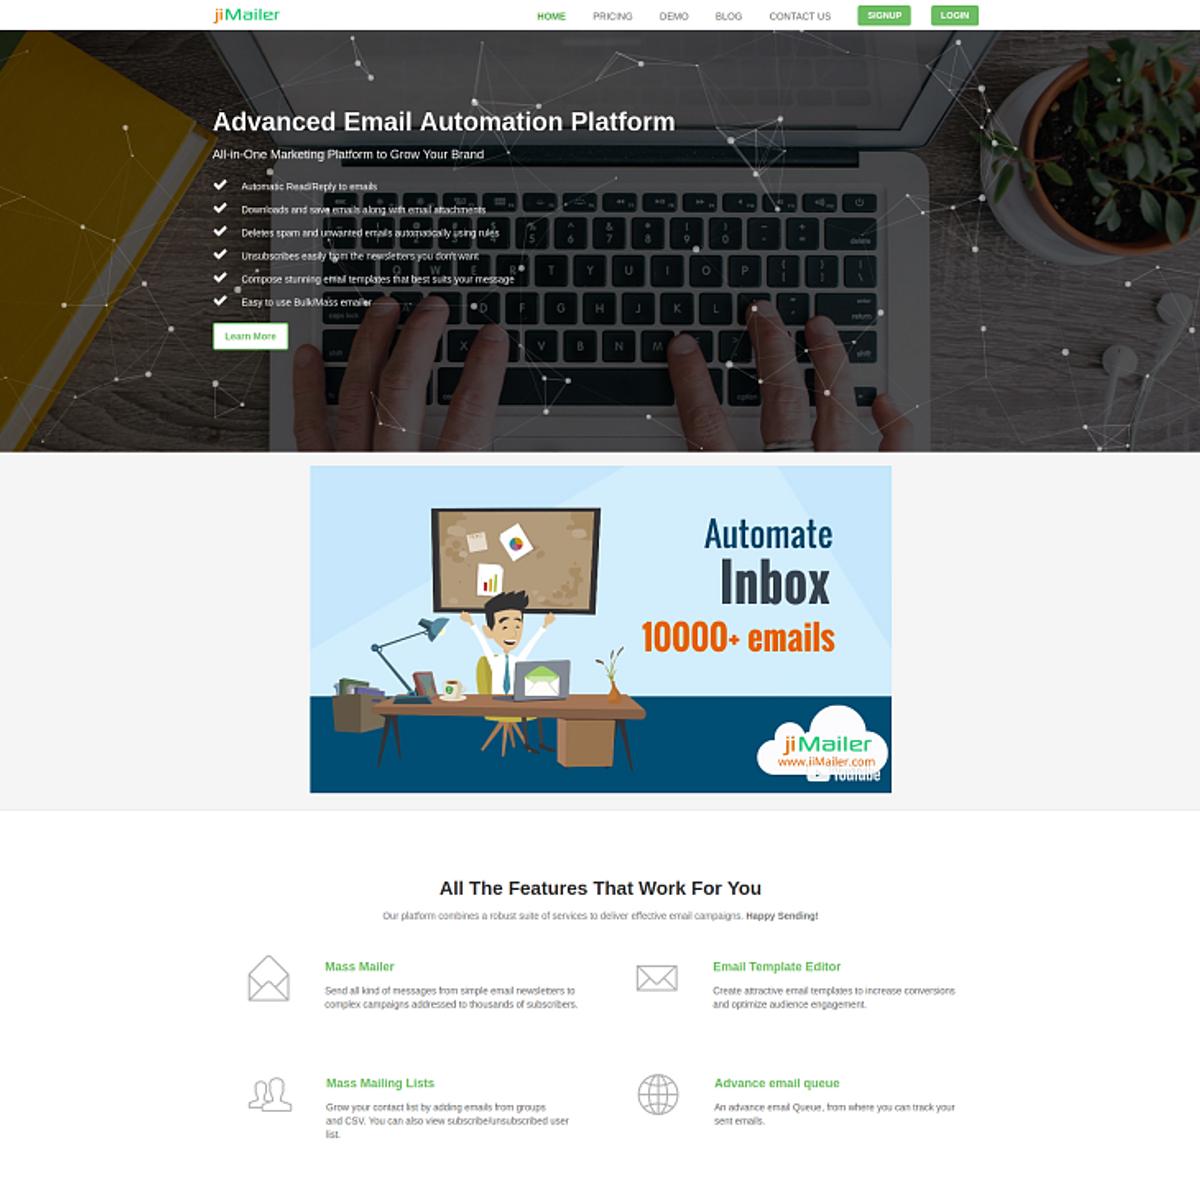 jiMailer Alternatives and Similar Websites and Apps - AlternativeTo net